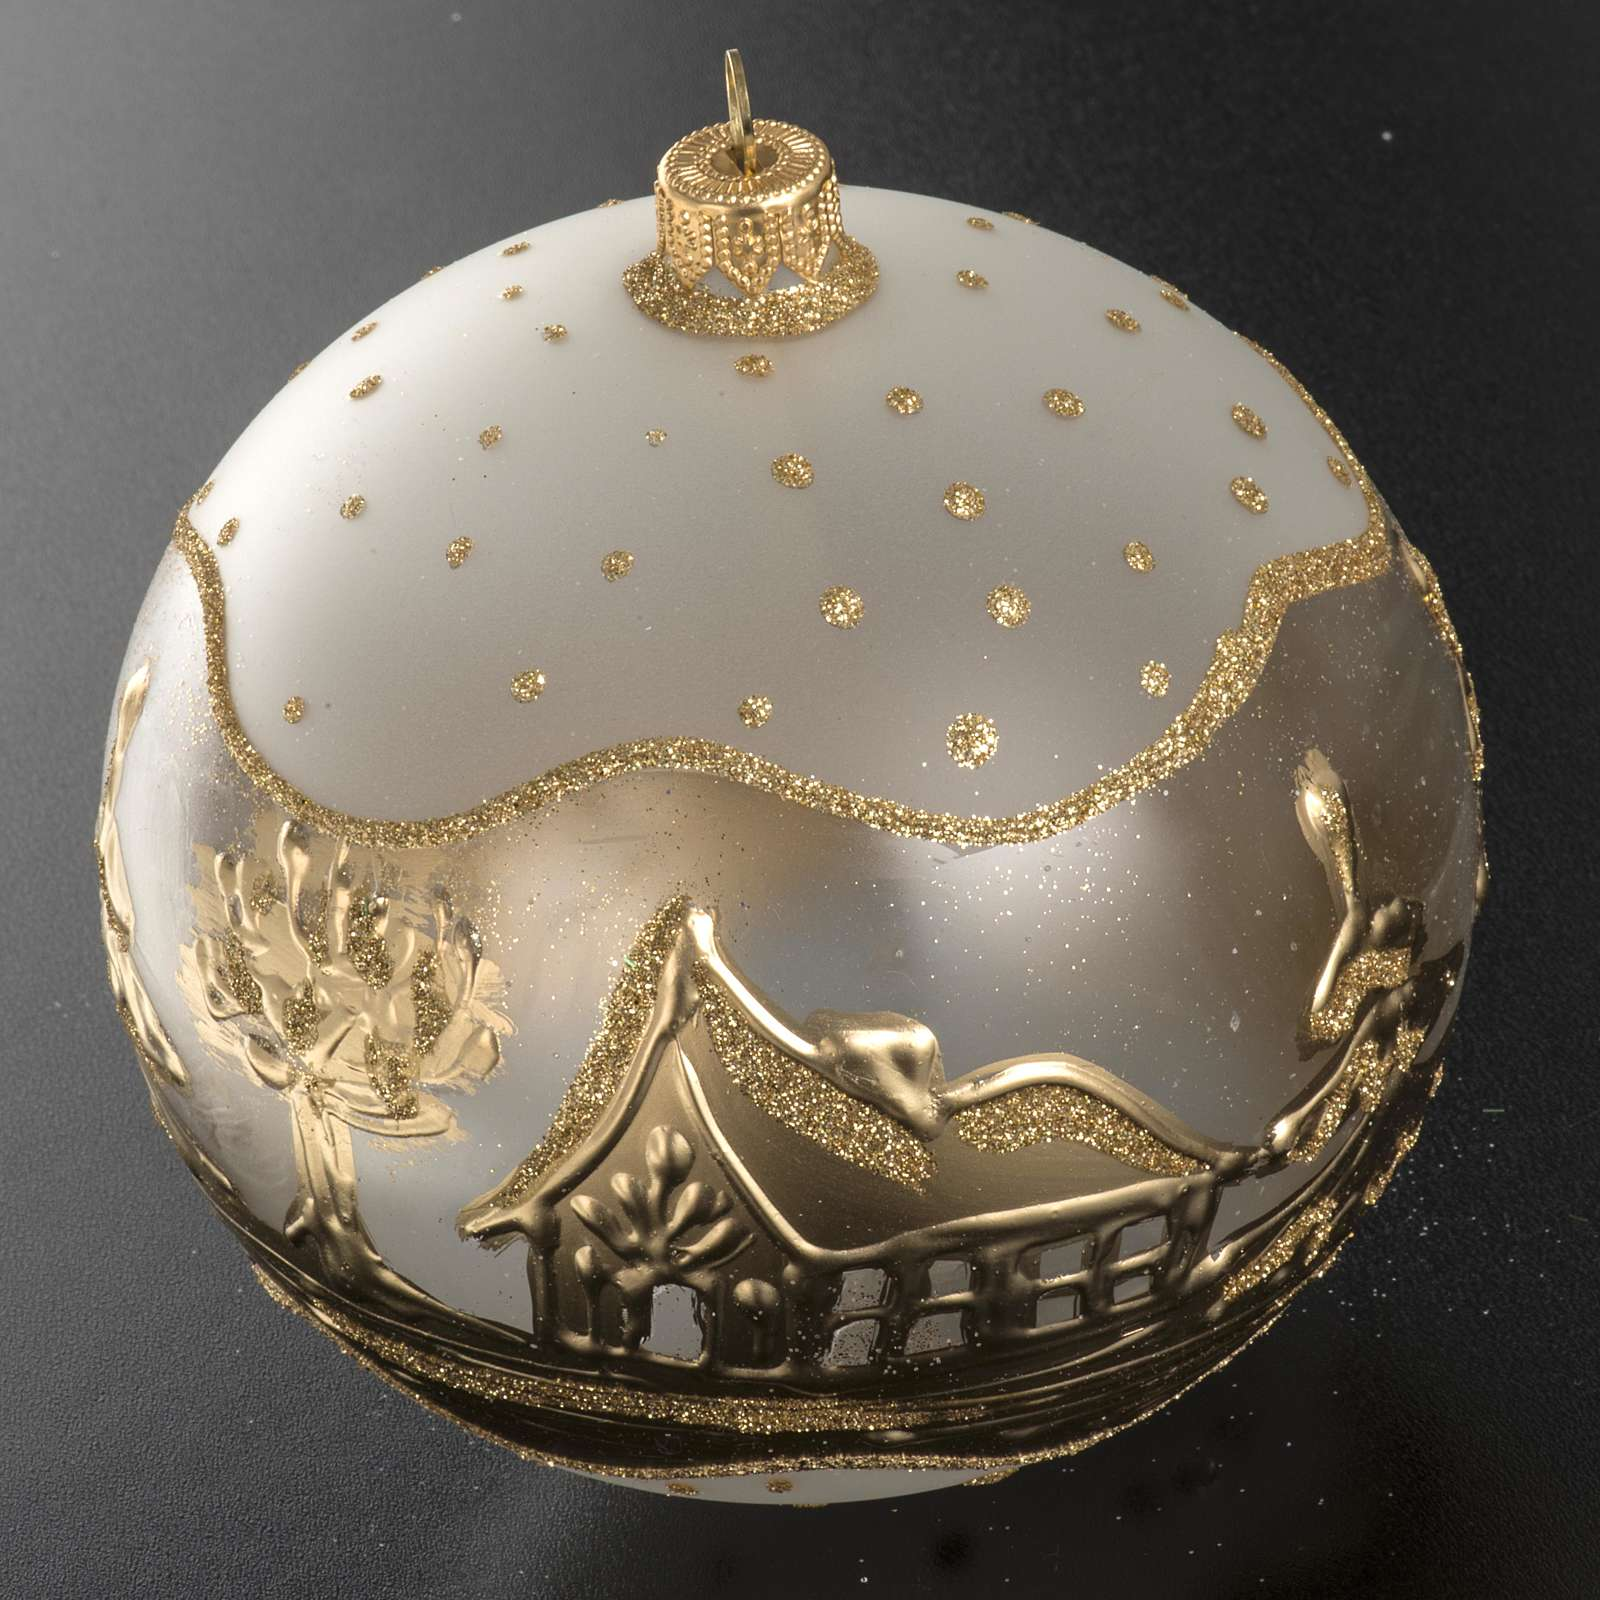 Addobbo albero Natale vetro bianco oro paese neve 12 cm 4